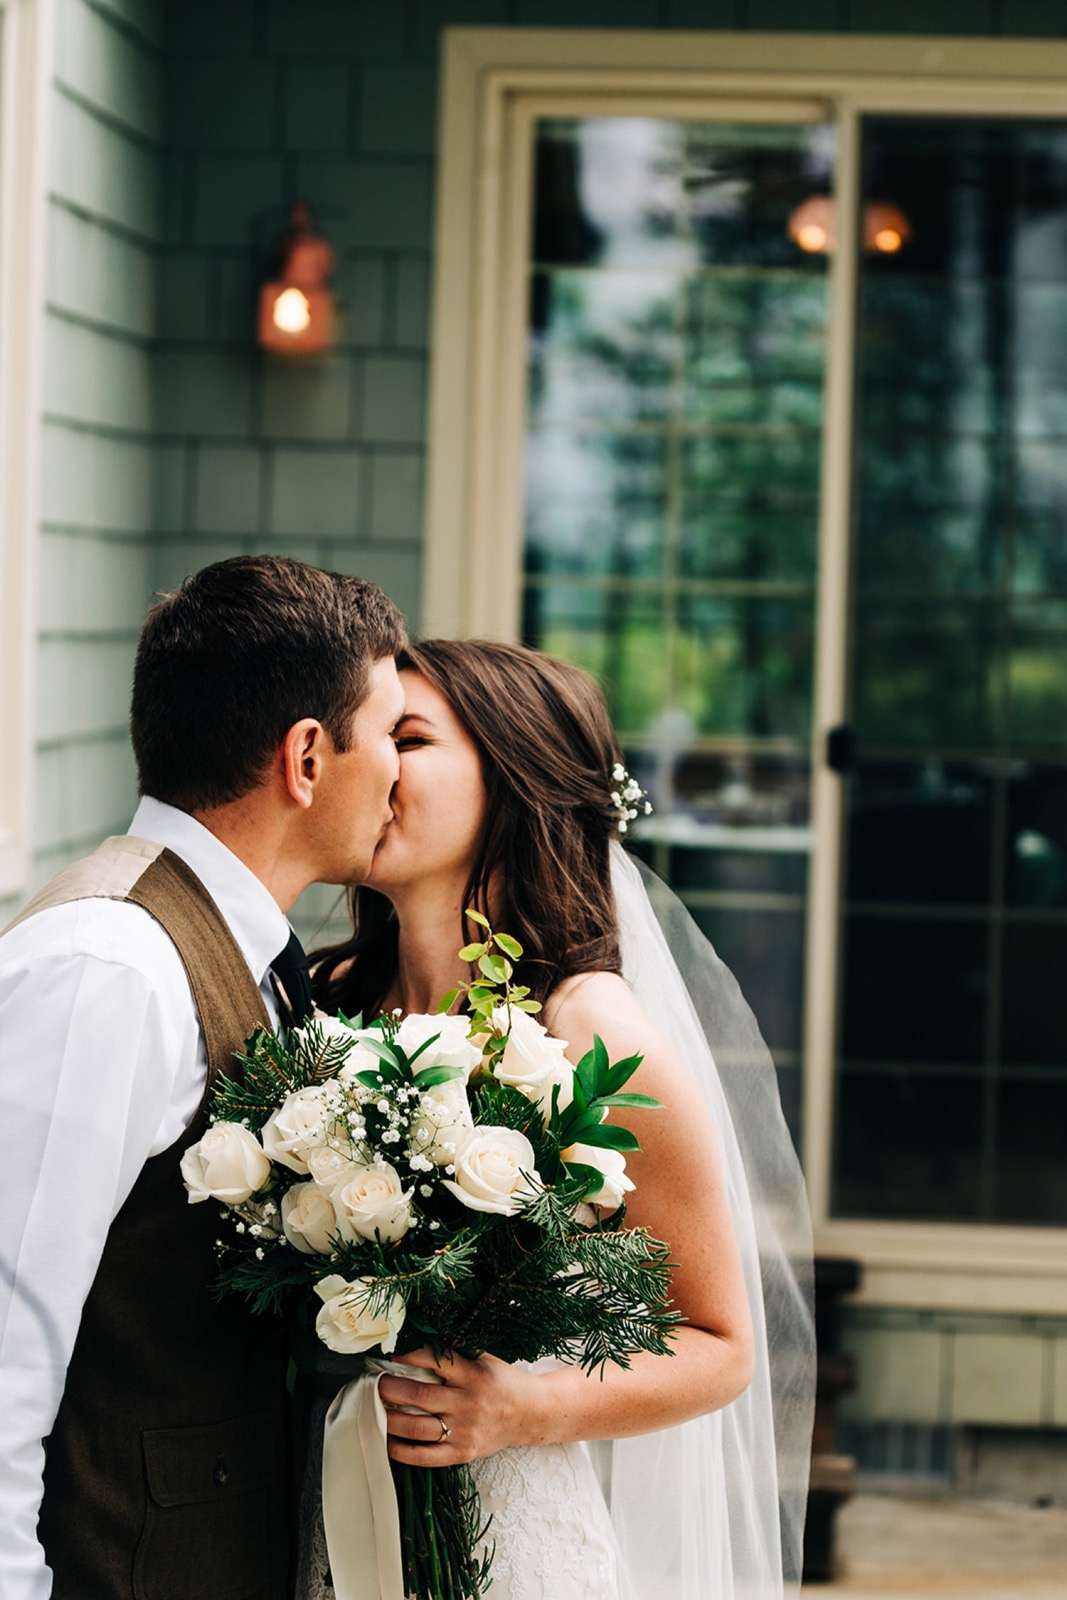 071_katie_chris_wedding-158.jpg